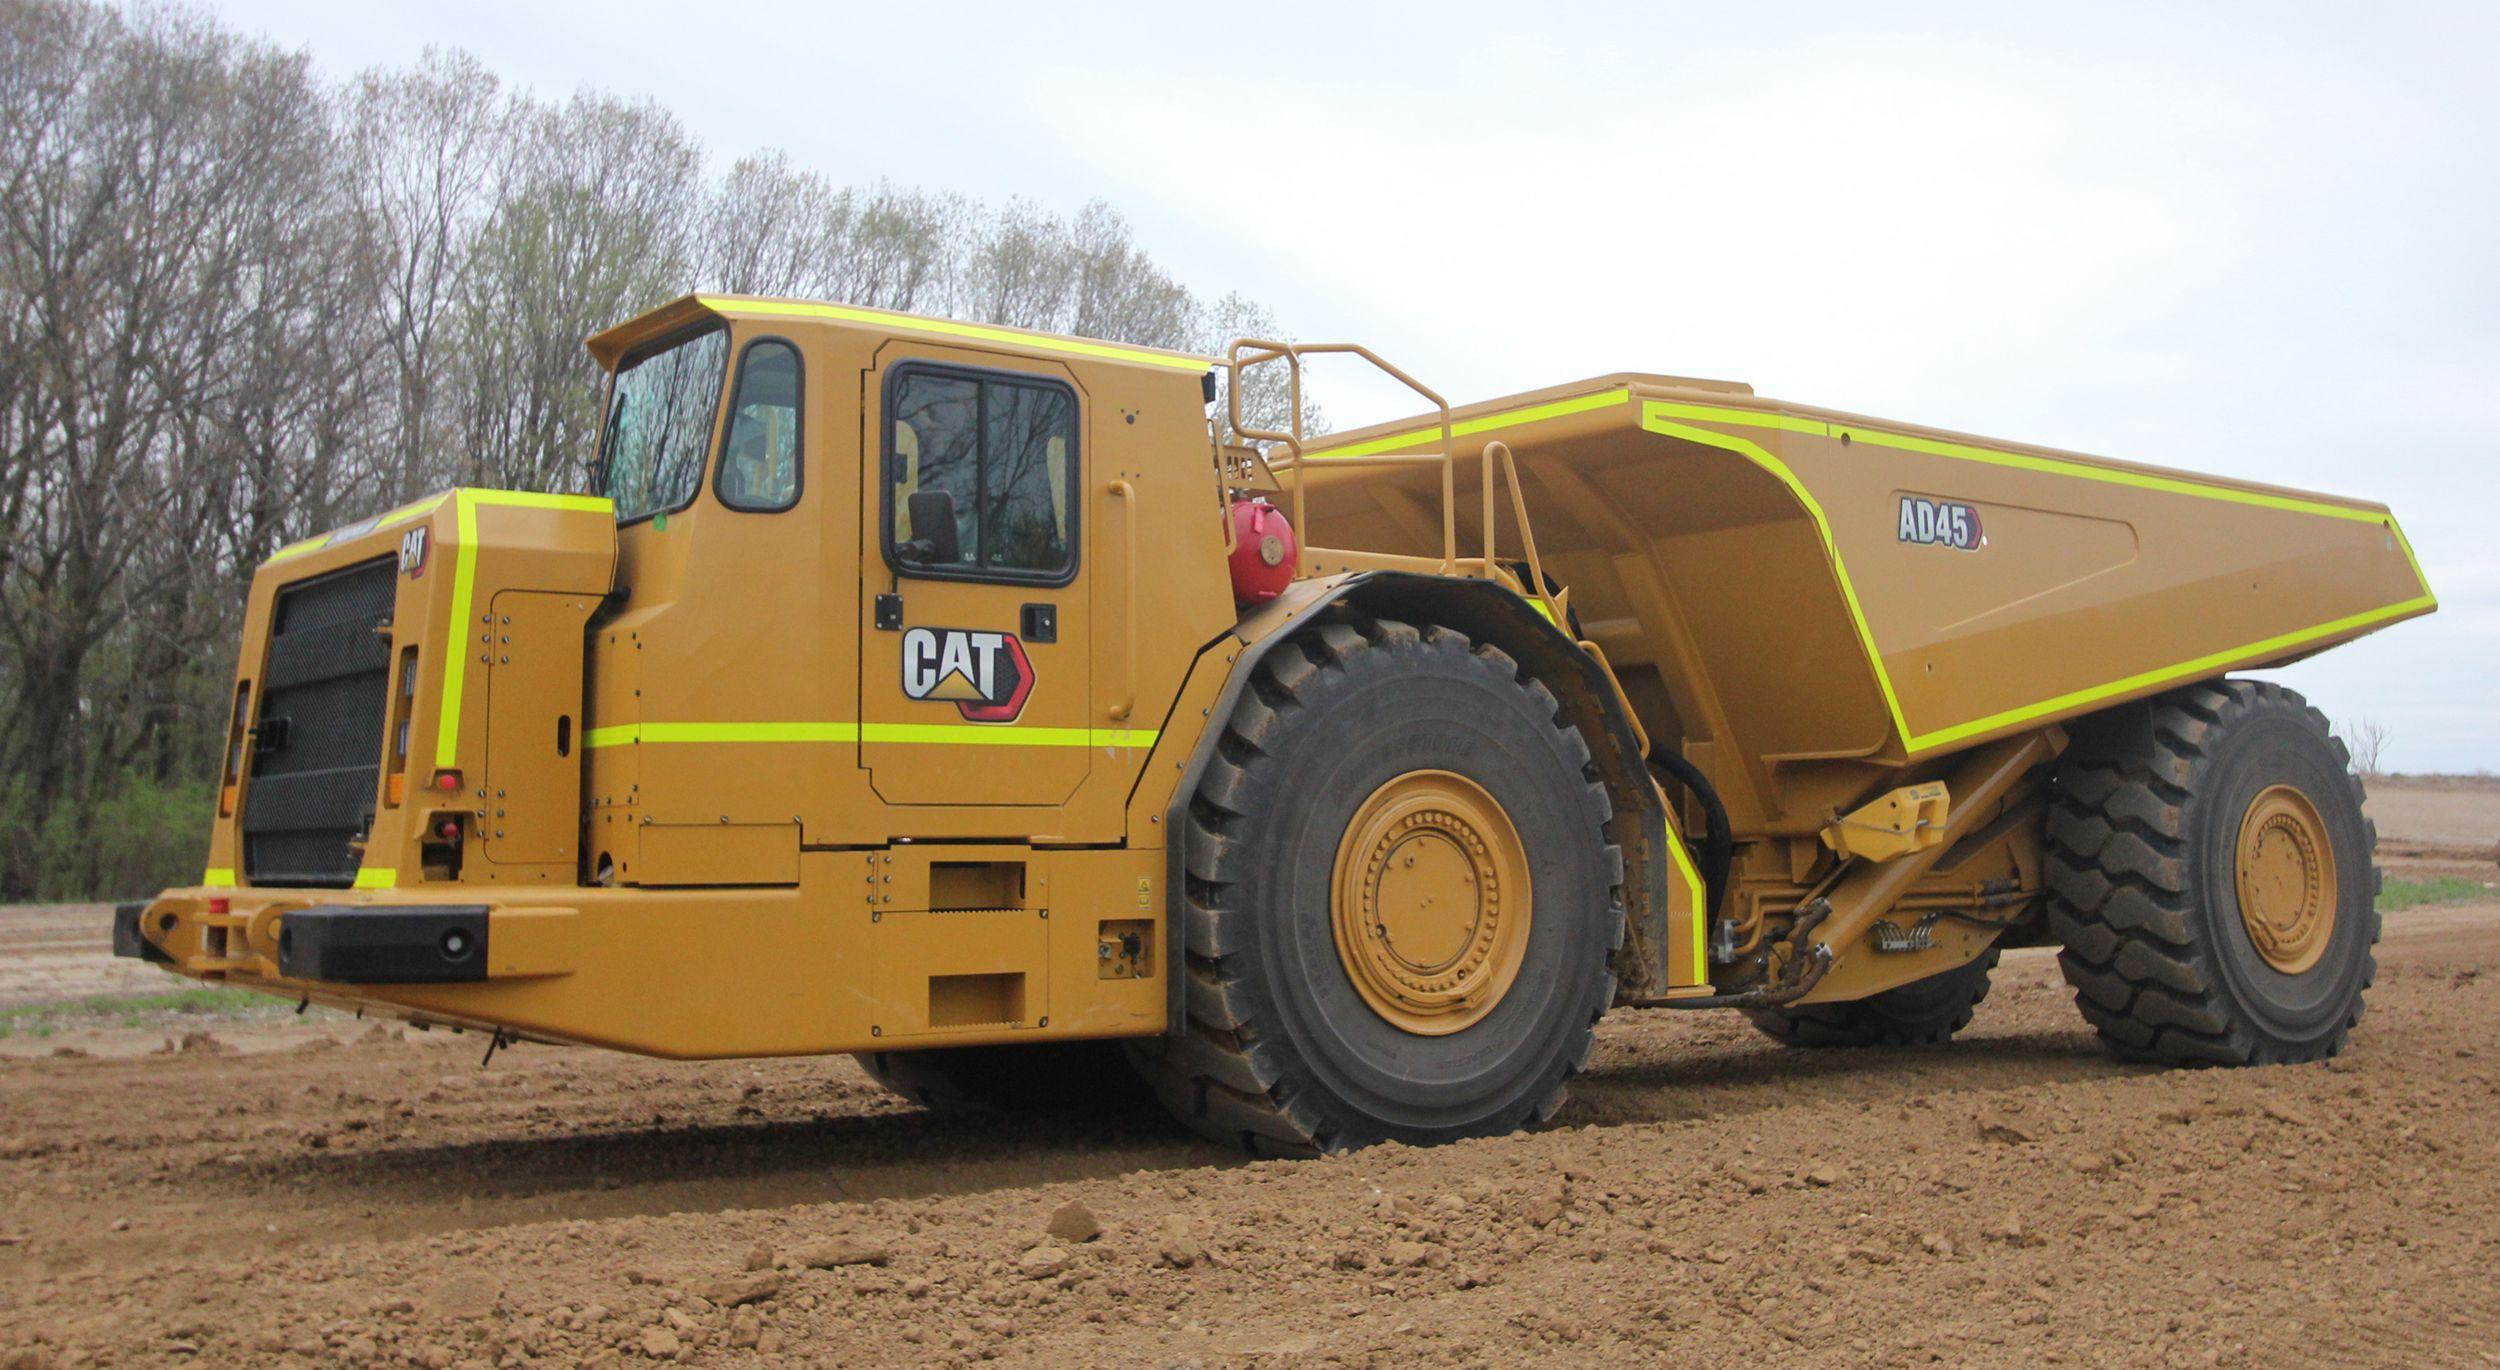 Cat AD45 Underground Truck on surface